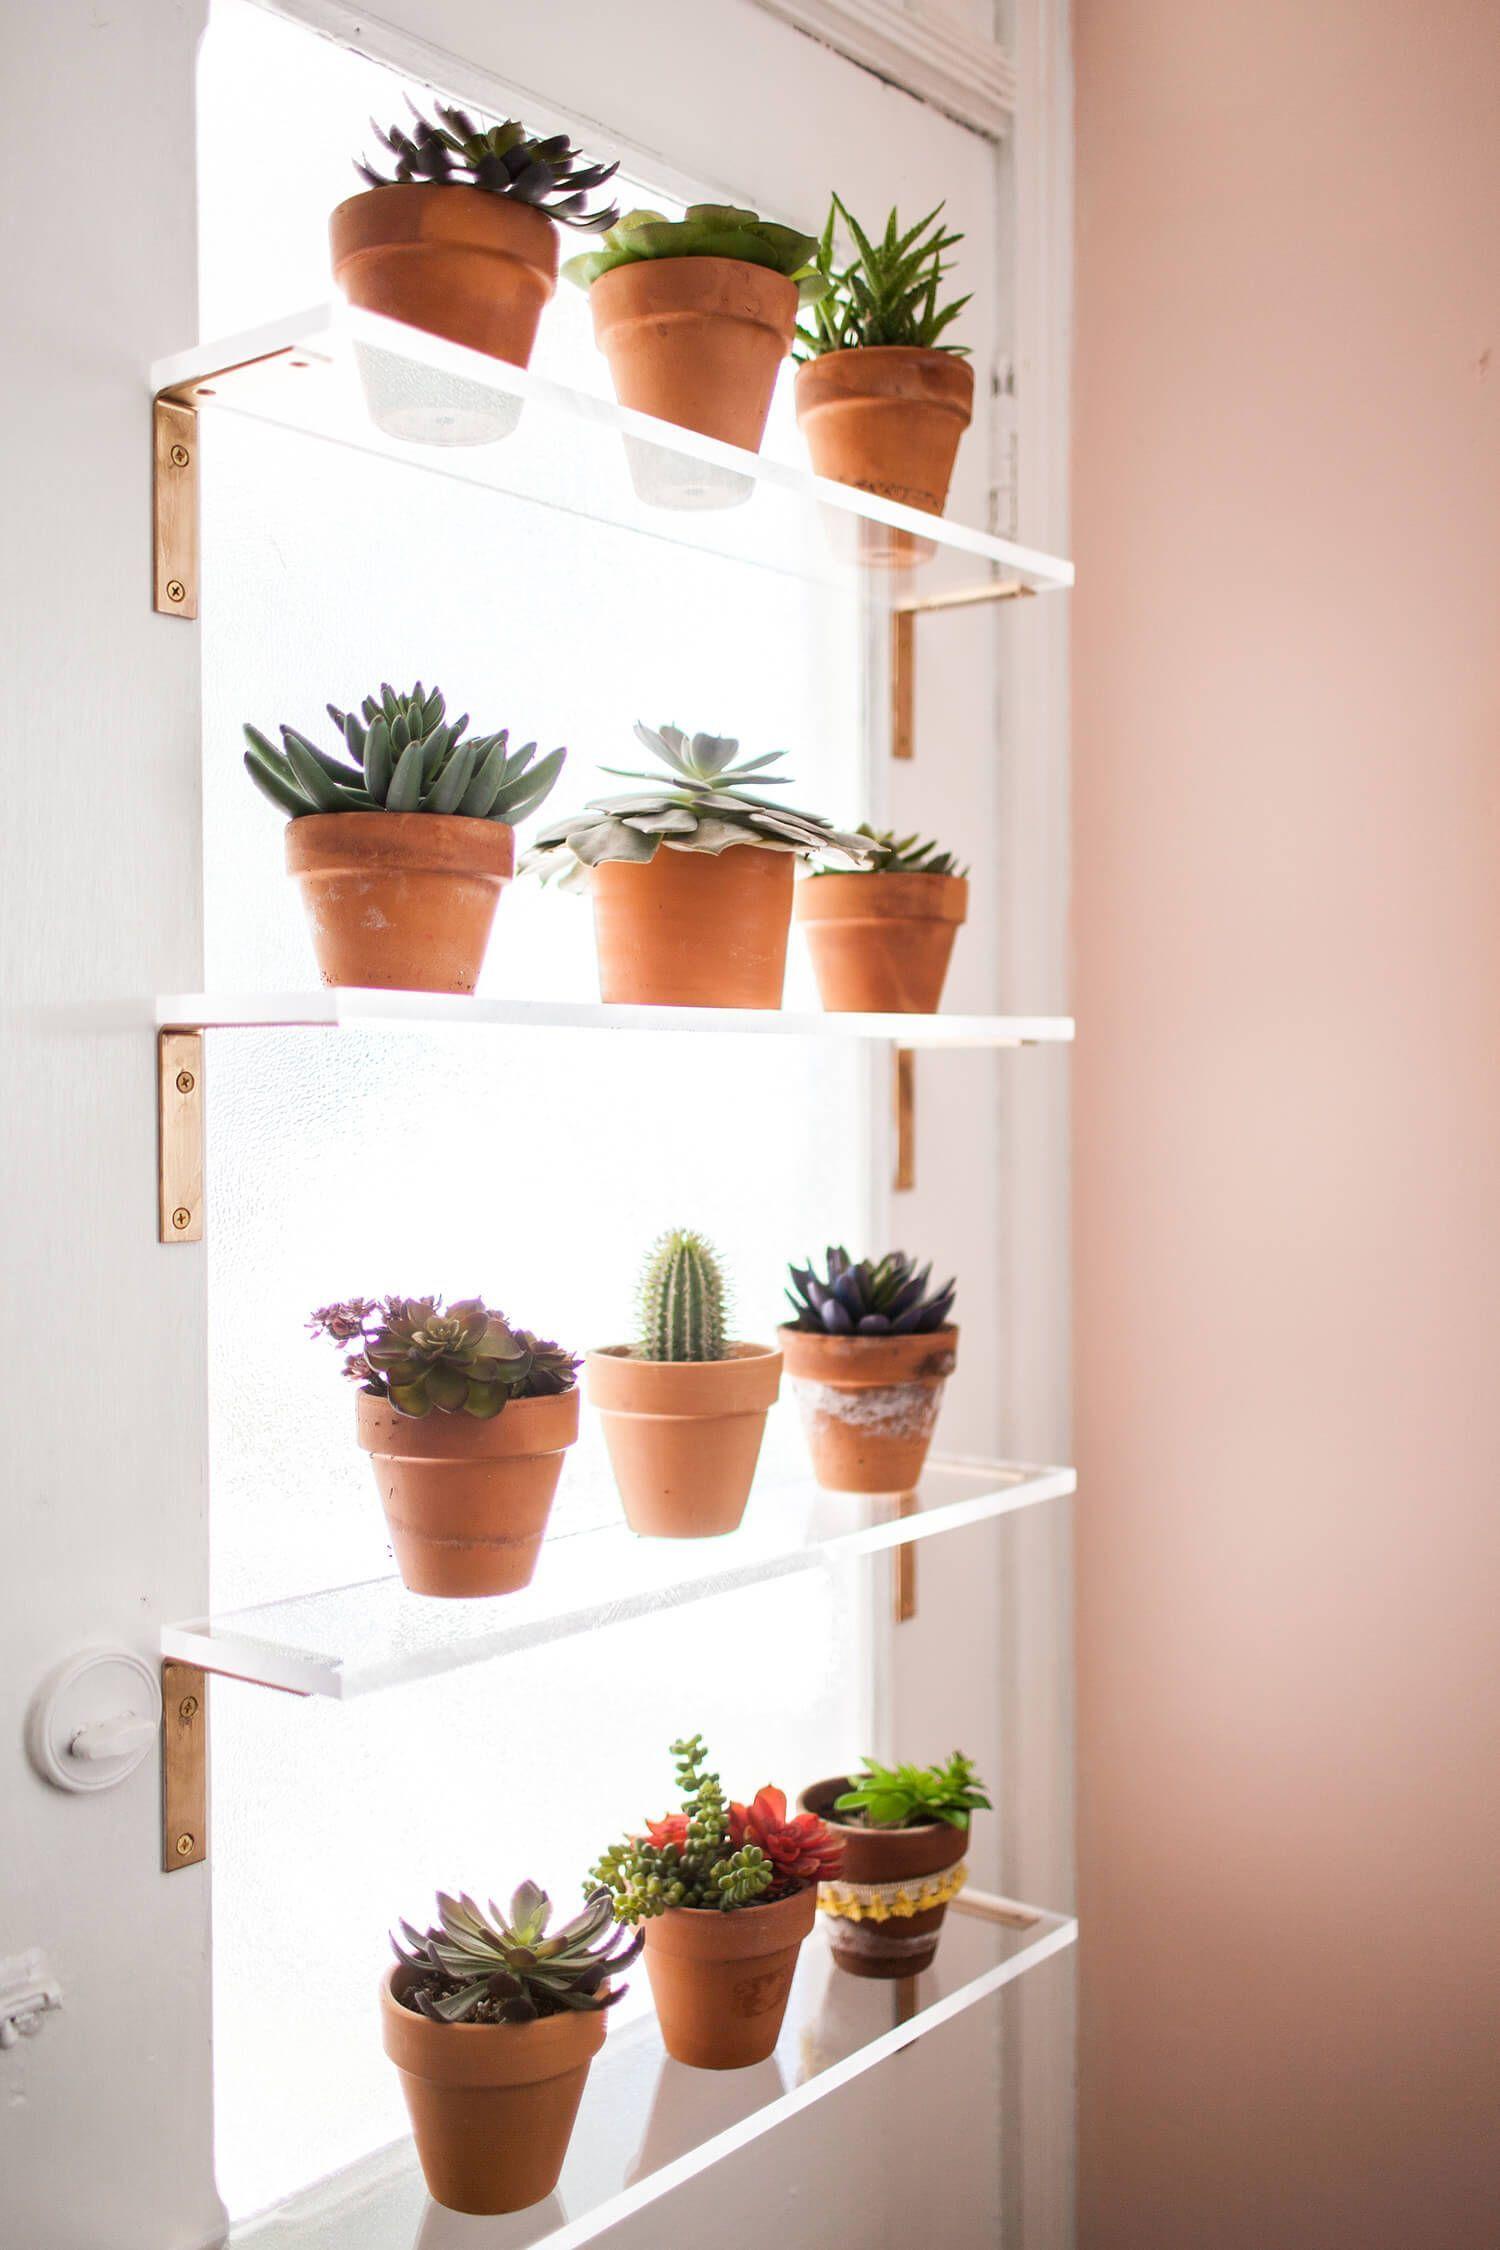 office floating shelves. DIY Shelves | Easy Floating For Bathroom,bedroom,kitchen,closet Bookshelves And Home Decor Ideas, Step By Tutorial Building Office S